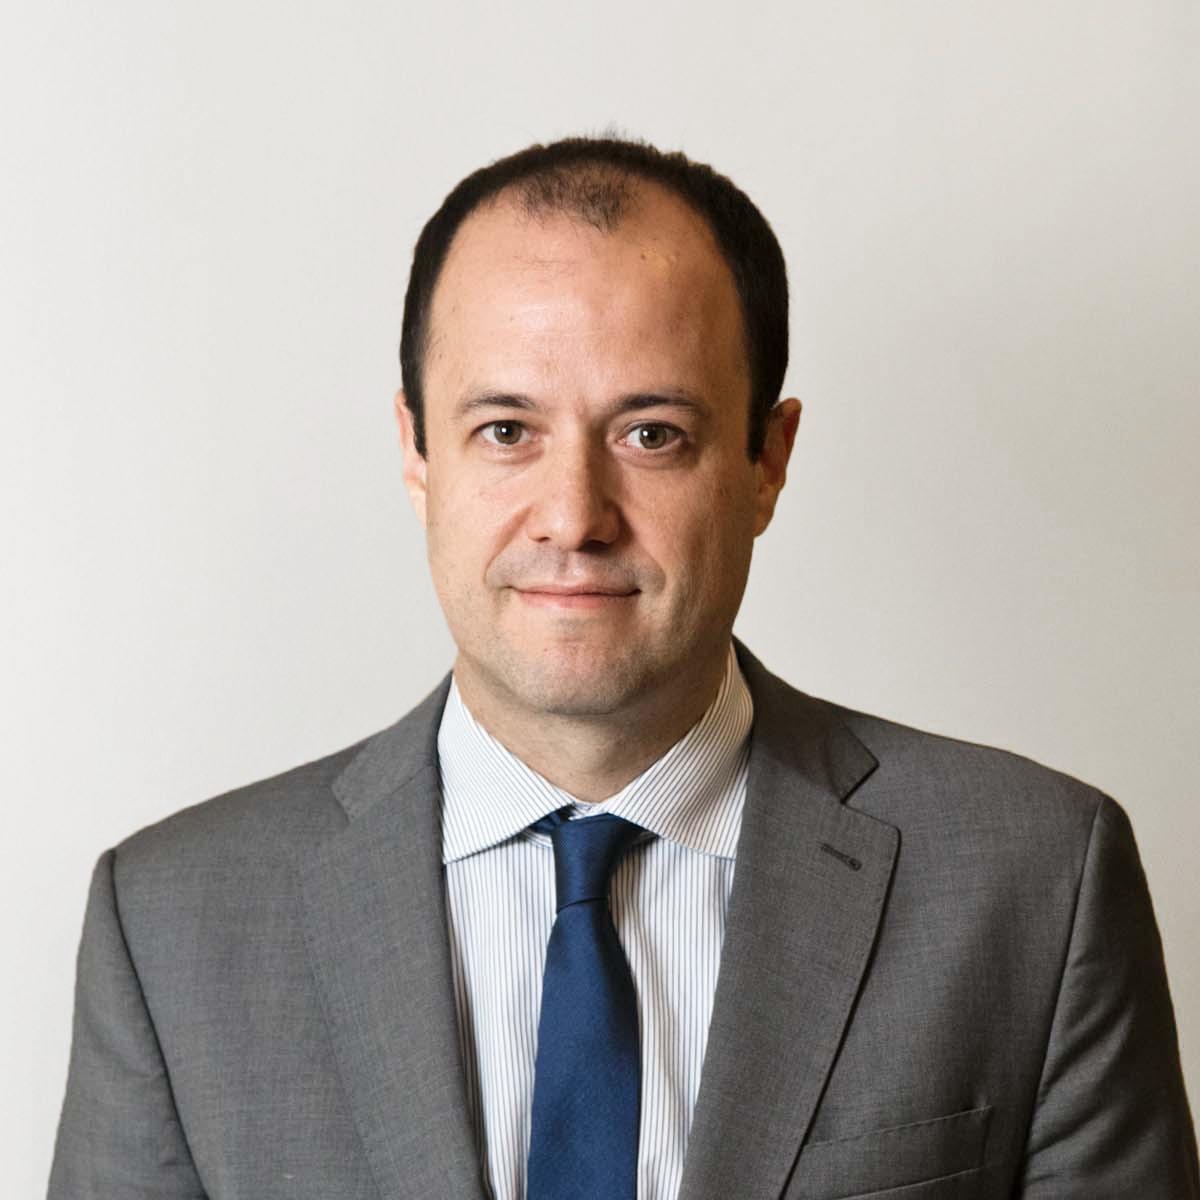 David Macià Pérez - Director de Inversiones y Estrategias en Crèdit Andorrà